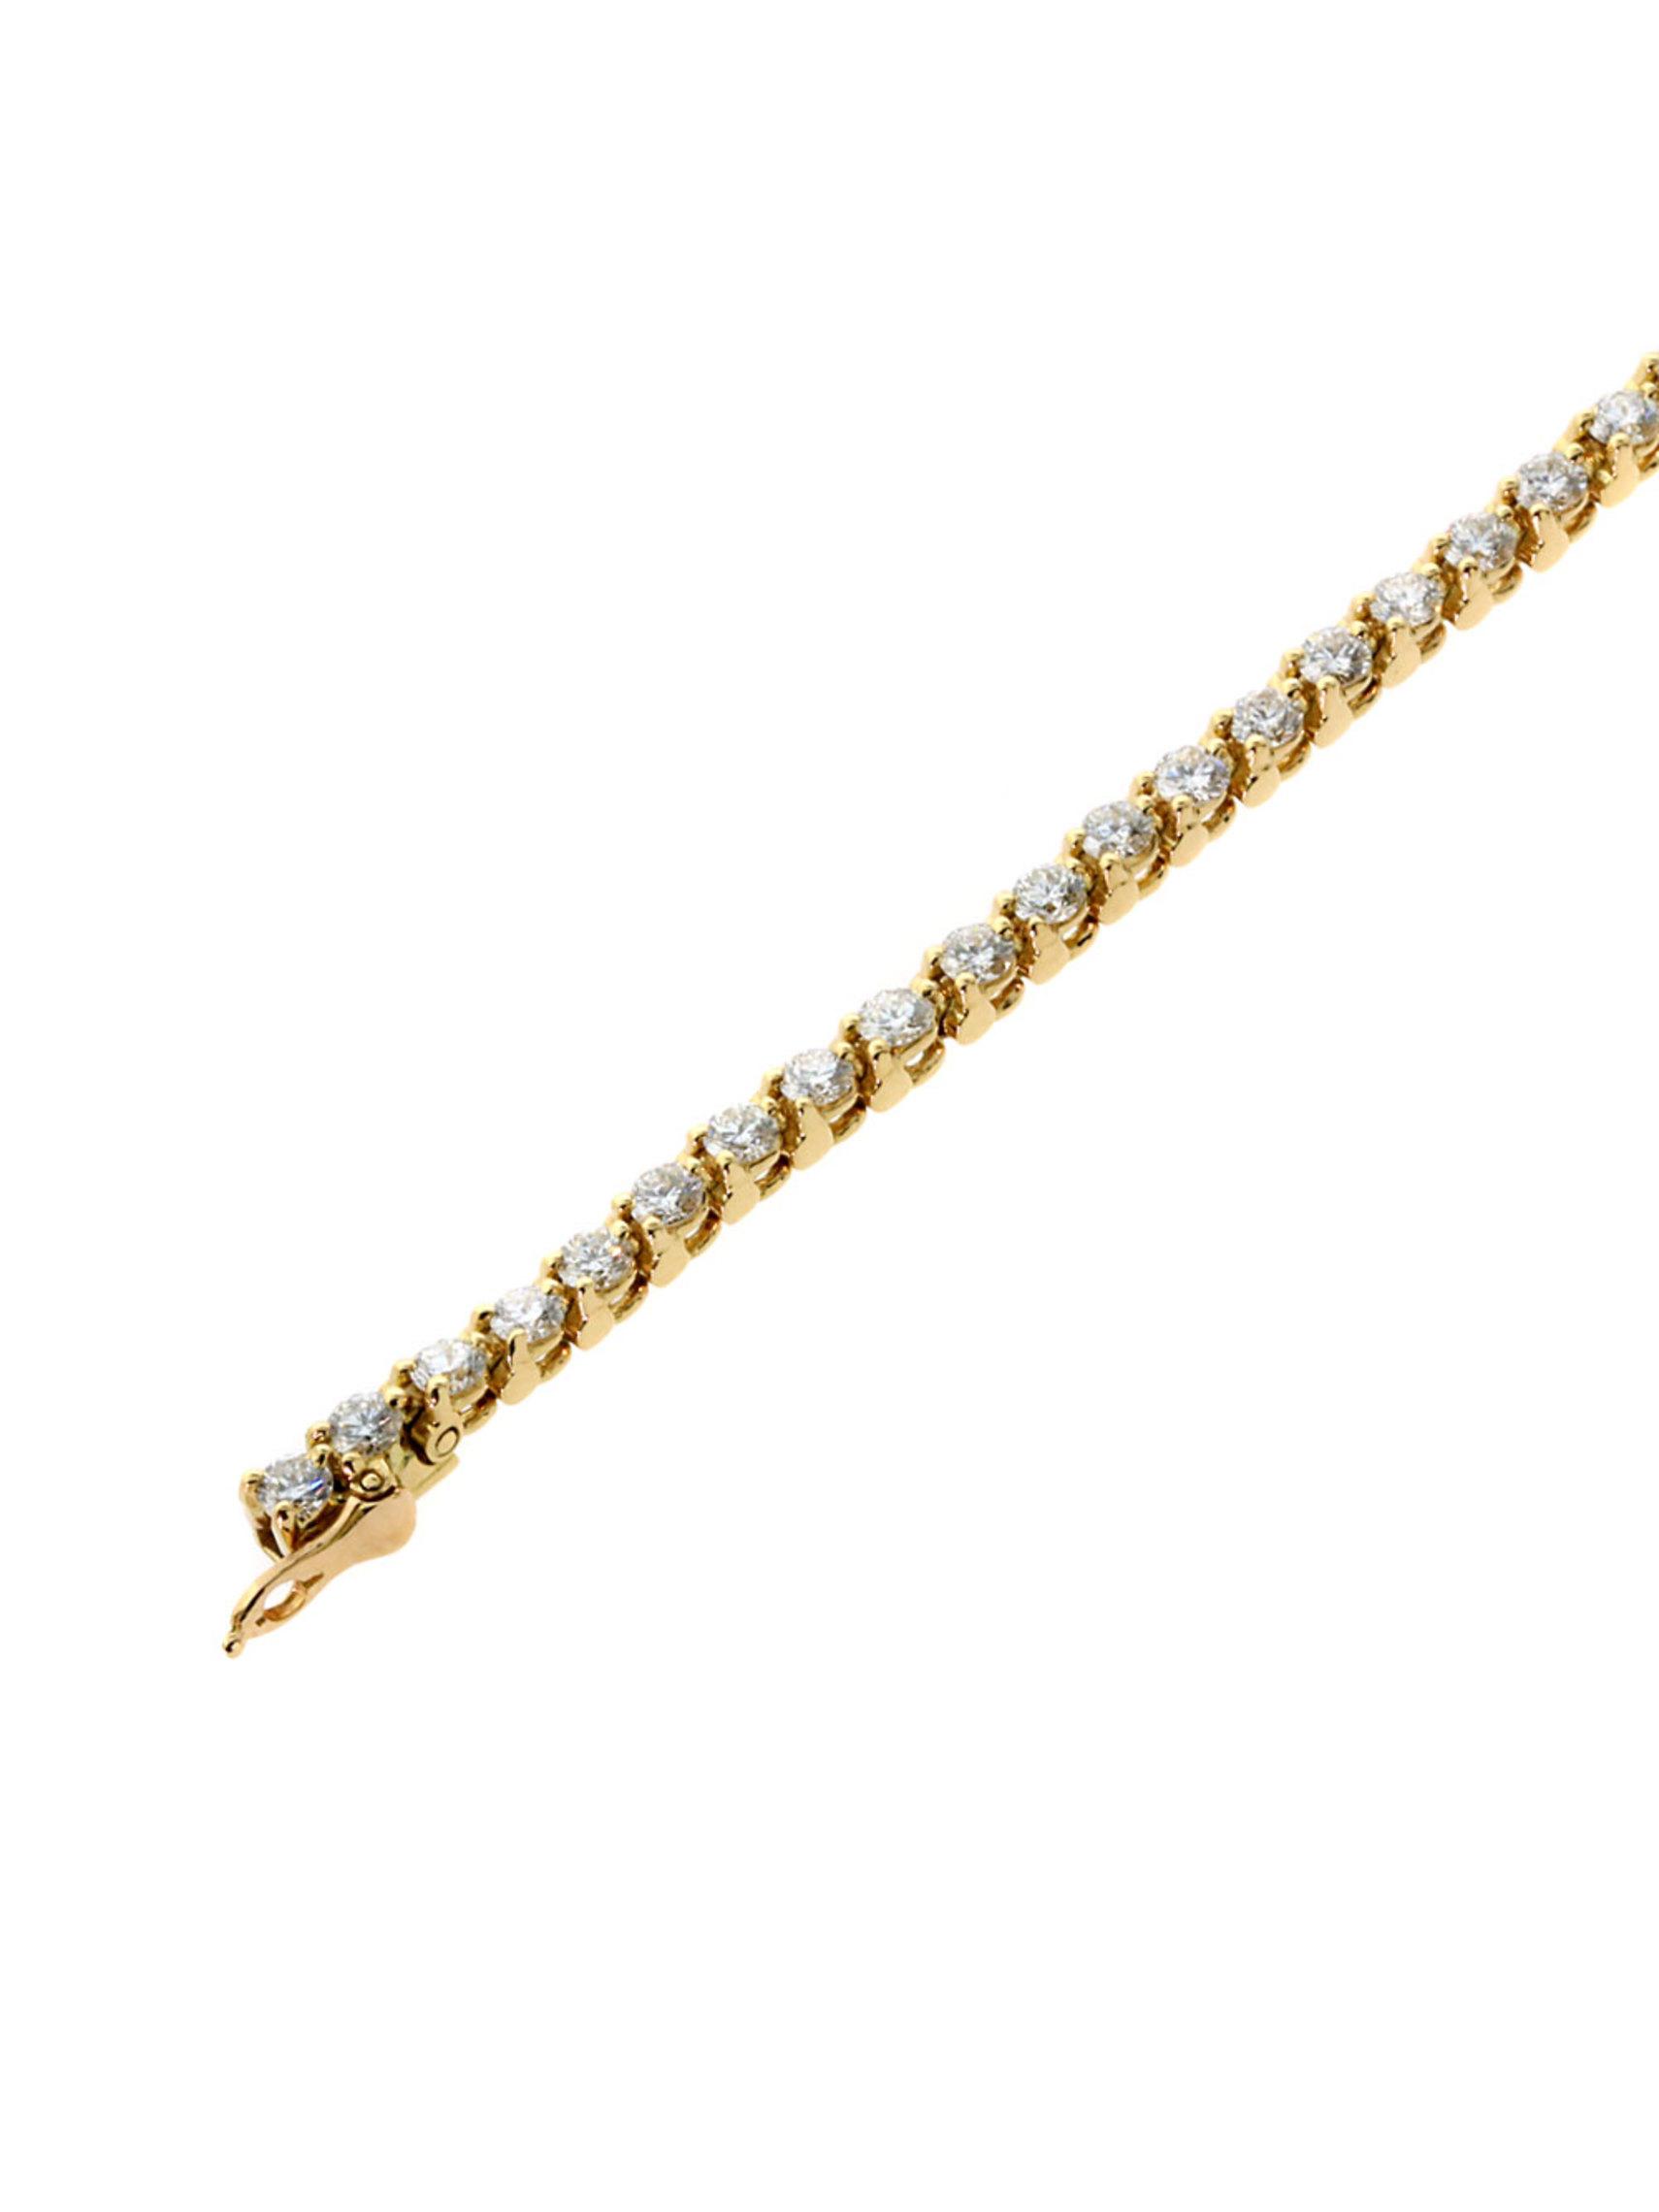 Cartier Diamond Tennis Bracelet